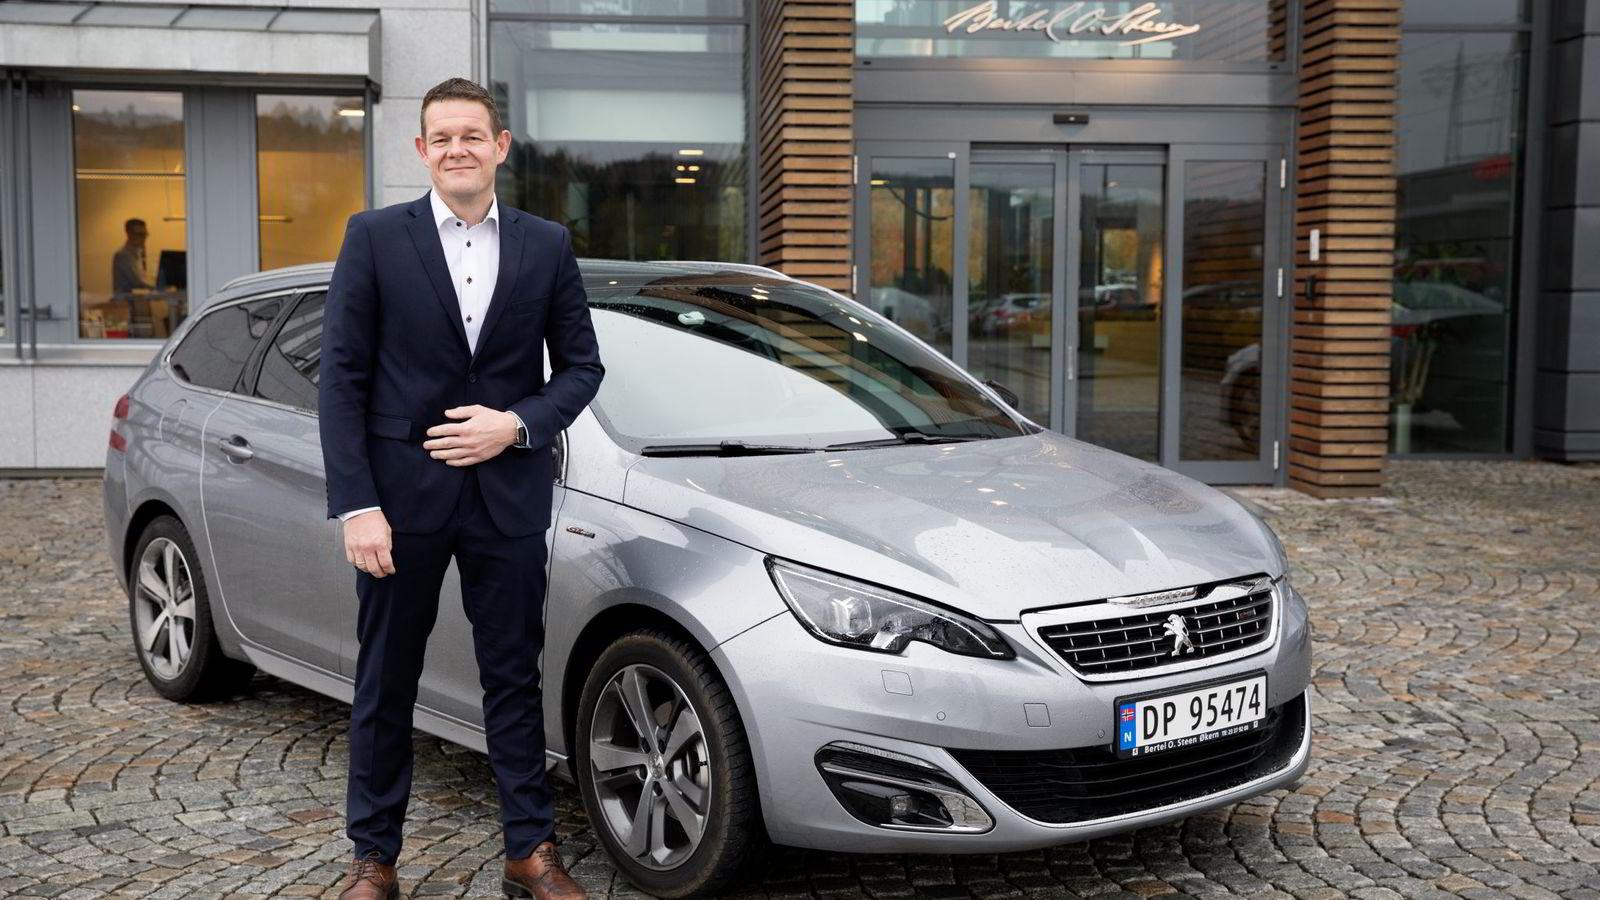 Peugeot-sjef Thorbjørn Myrhaug kan glede seg over at Peugeot 308 SW for andre gang er kåret til Årets firmabil.